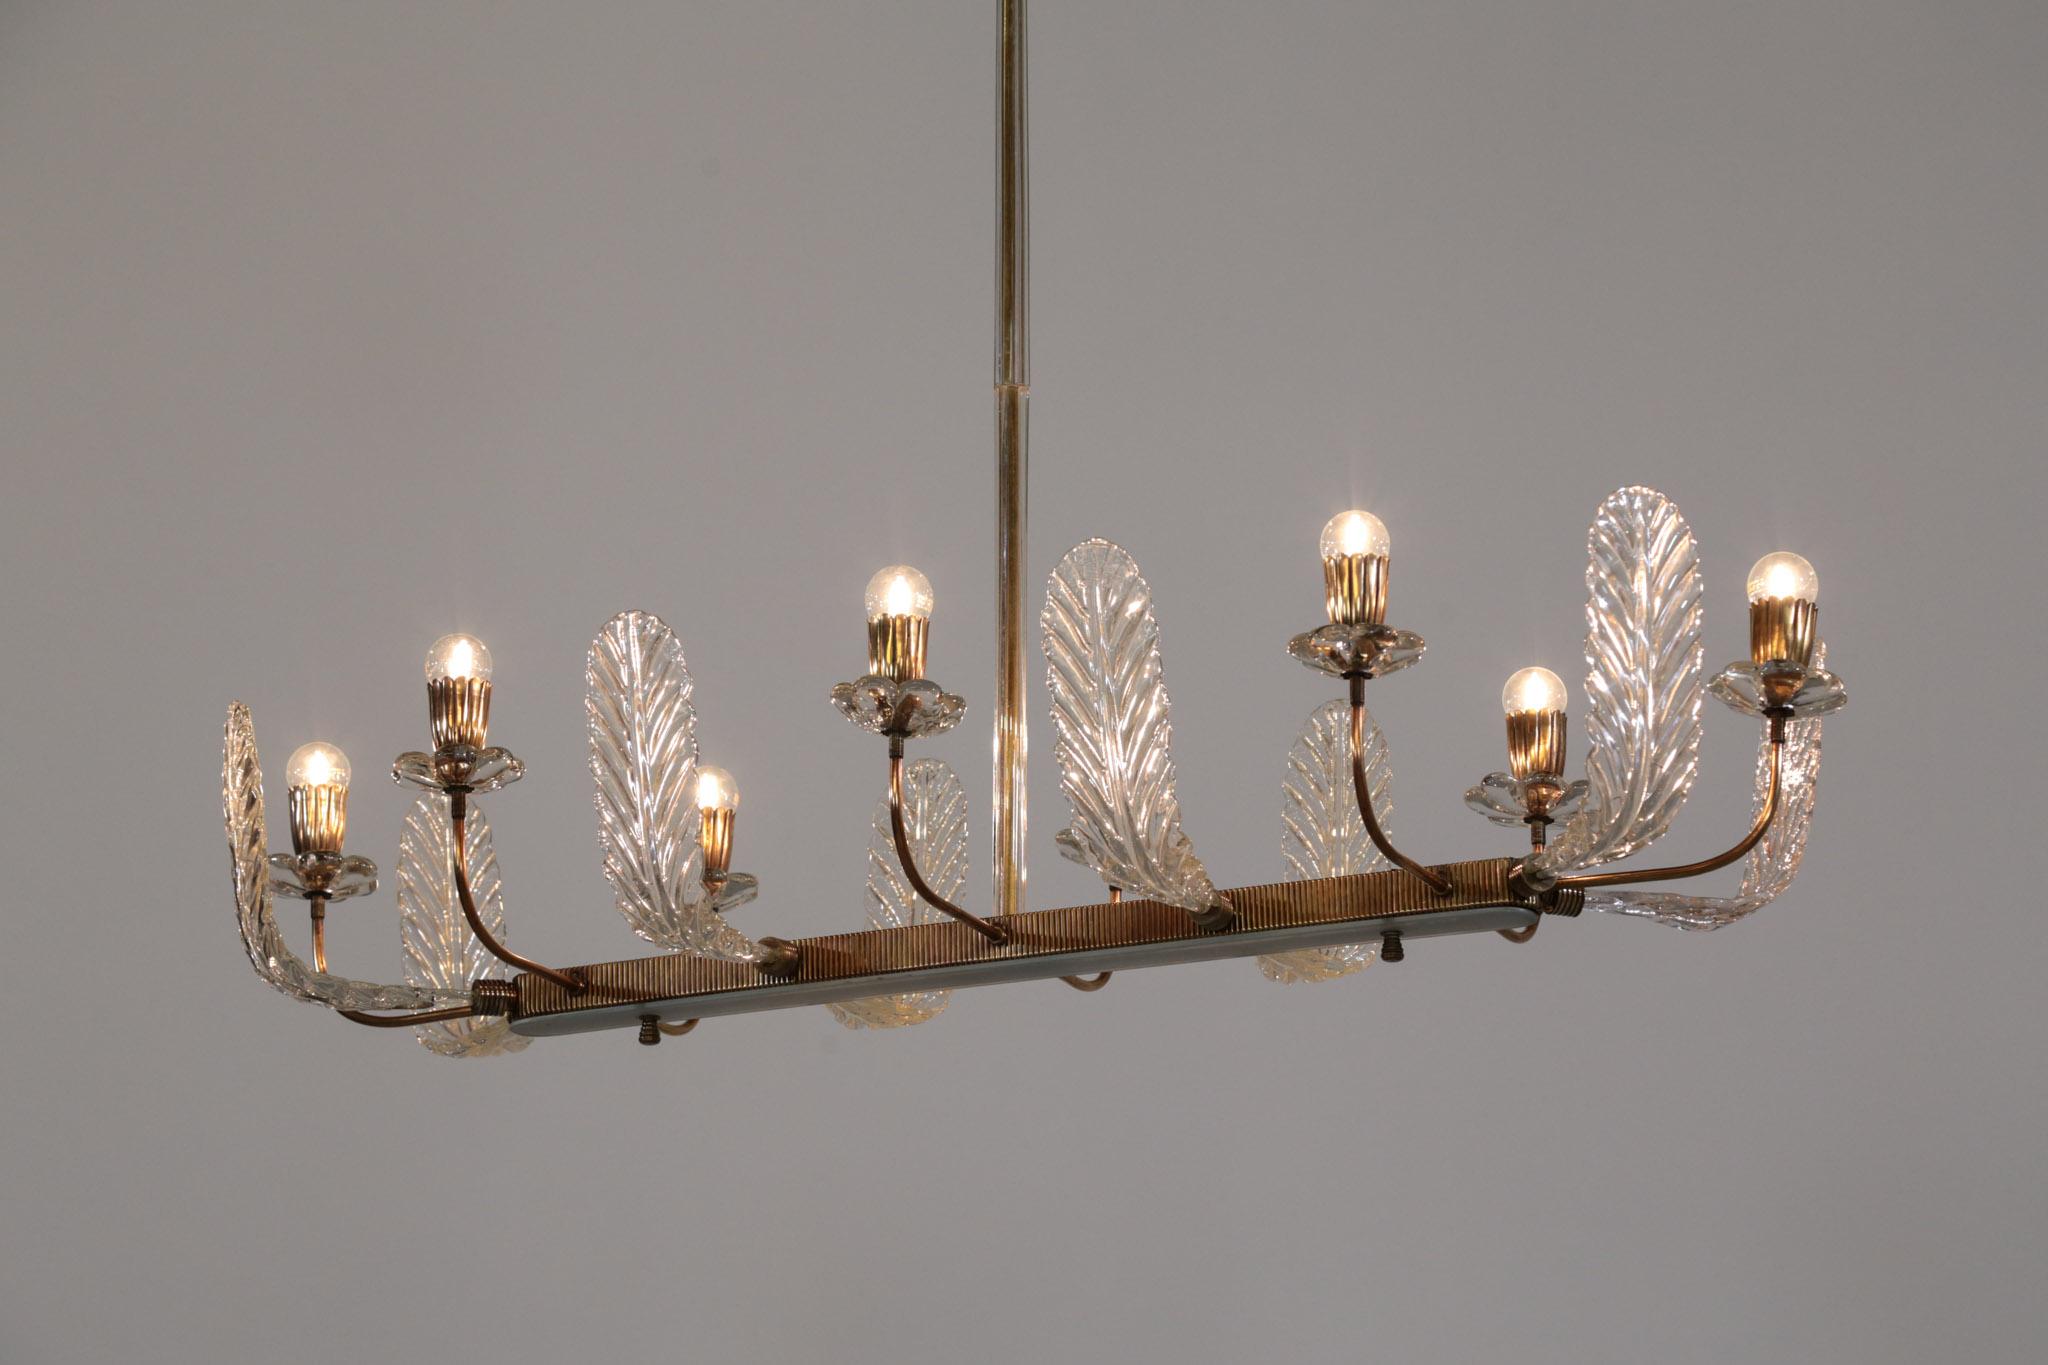 lustre barovier et toso verre de murano design italien danke galerie. Black Bedroom Furniture Sets. Home Design Ideas